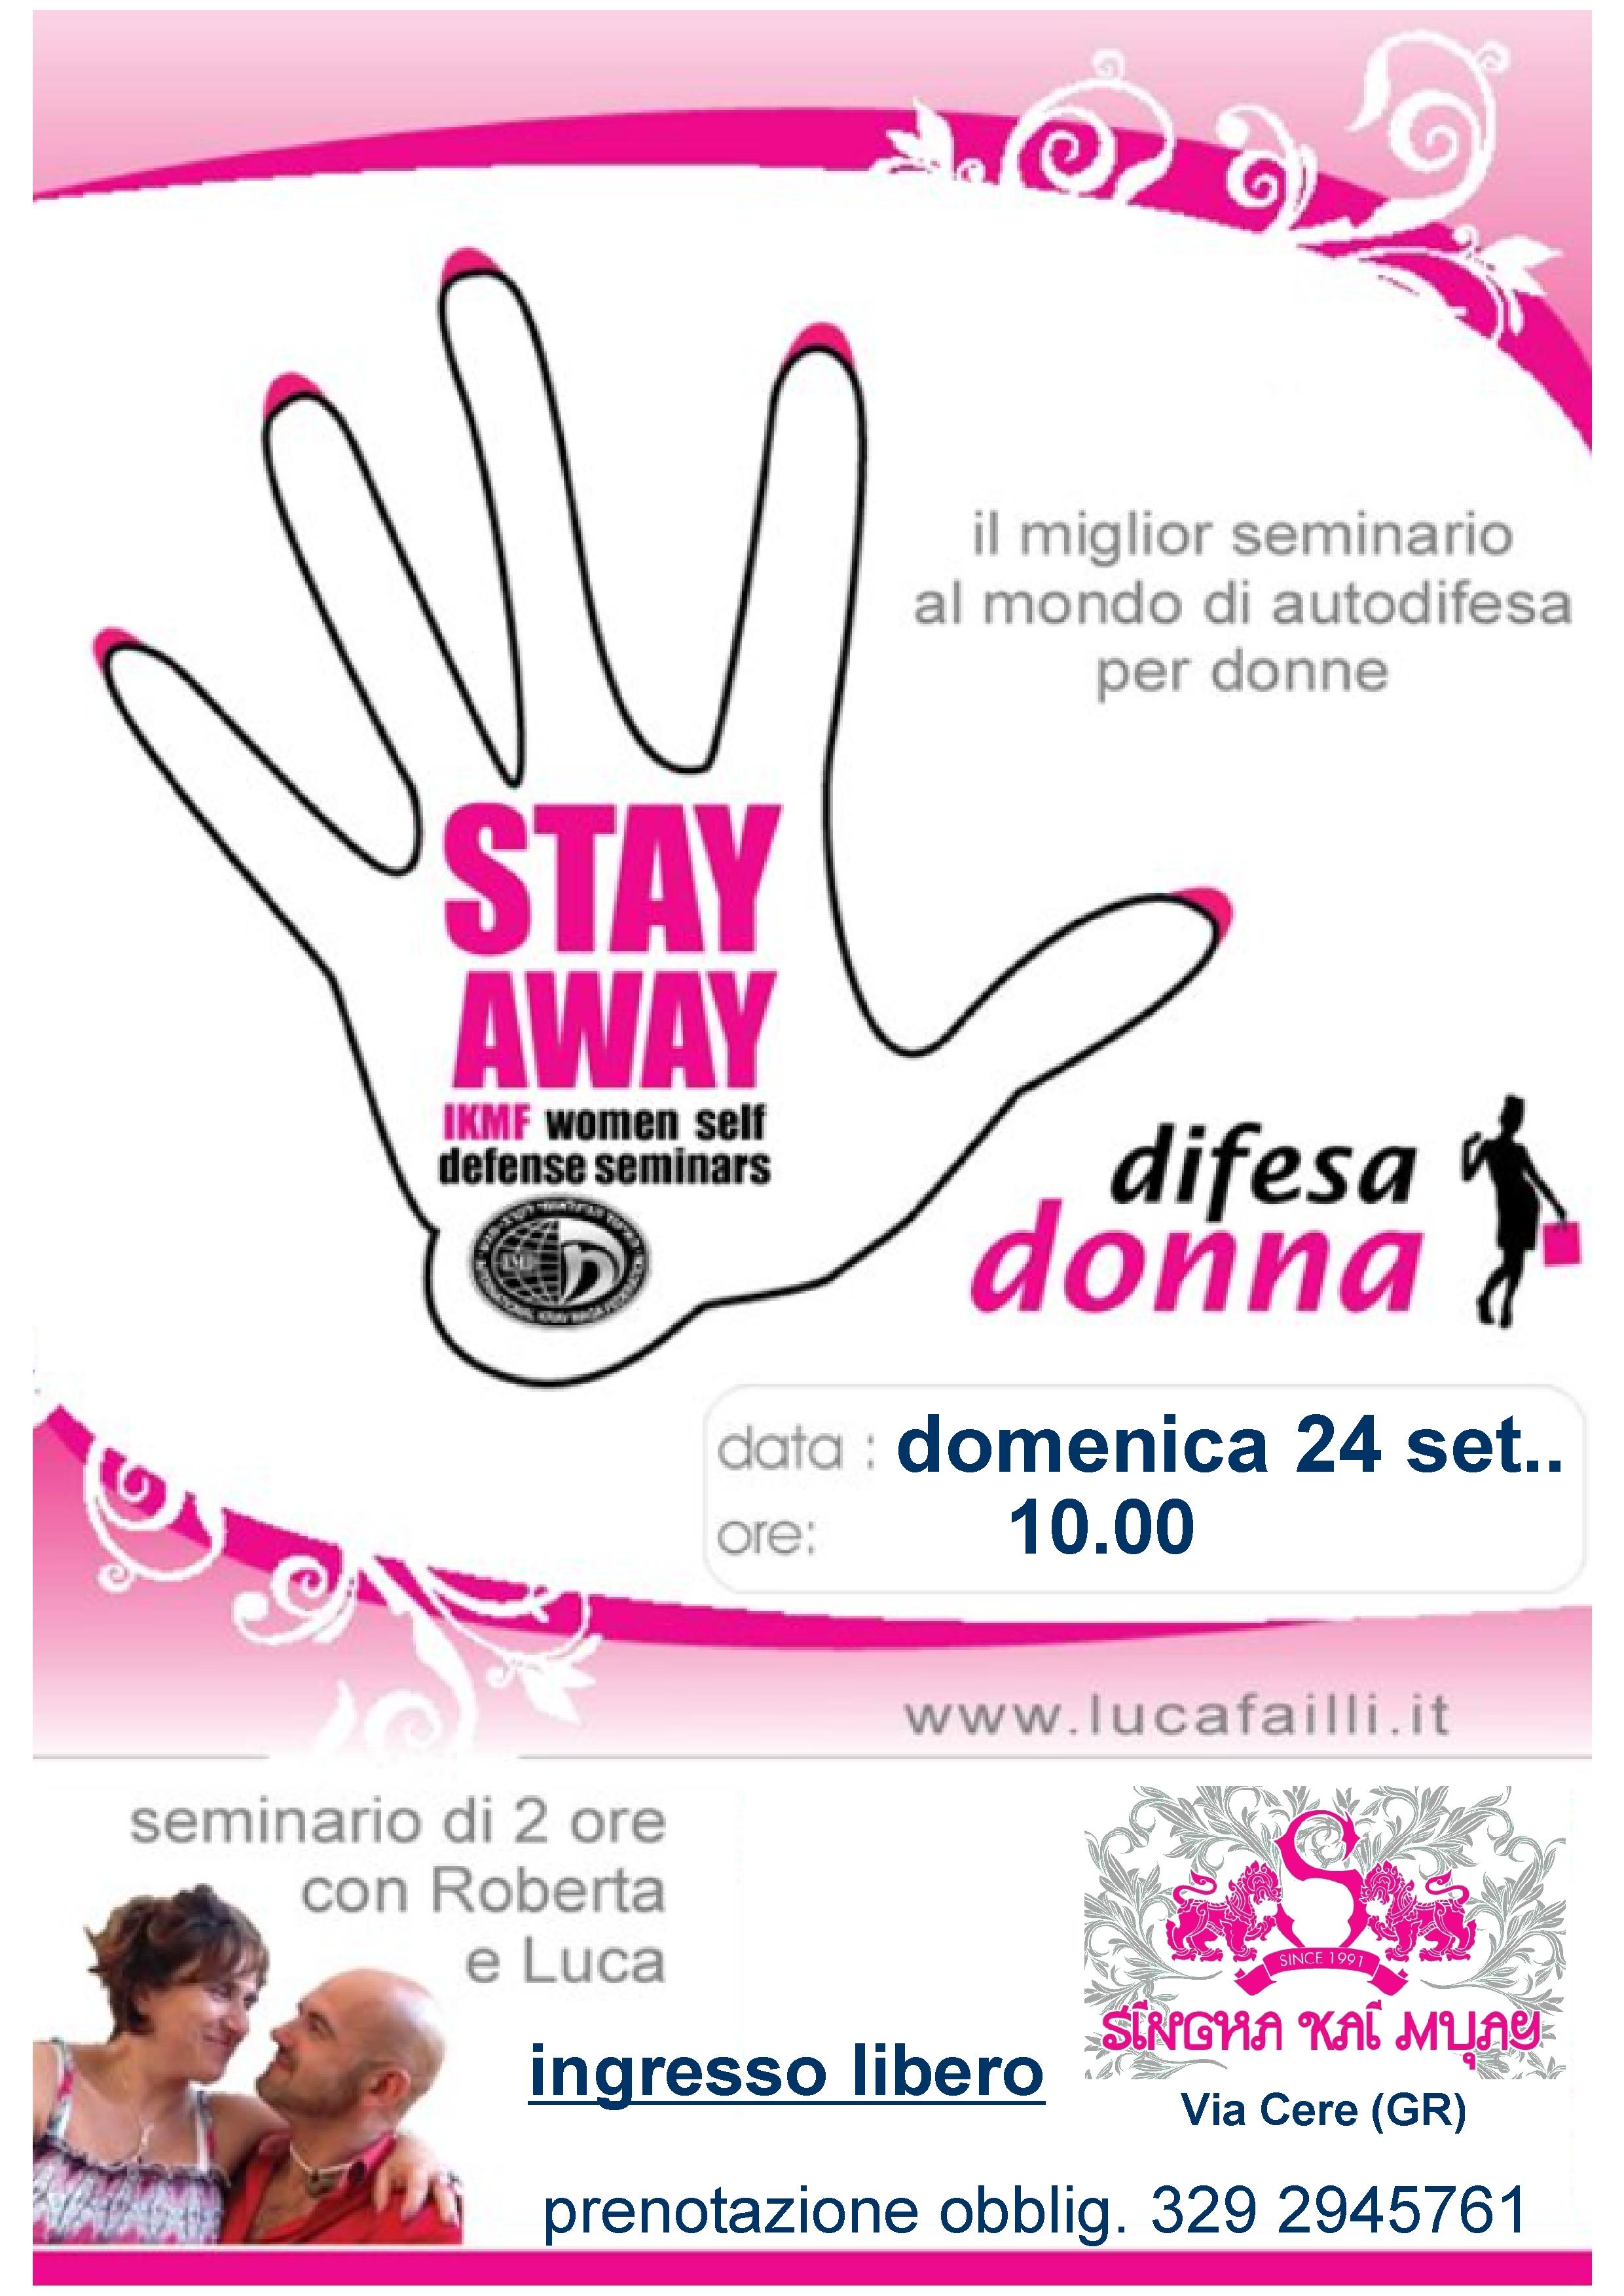 volantino_stay_away_singha_17.jpg